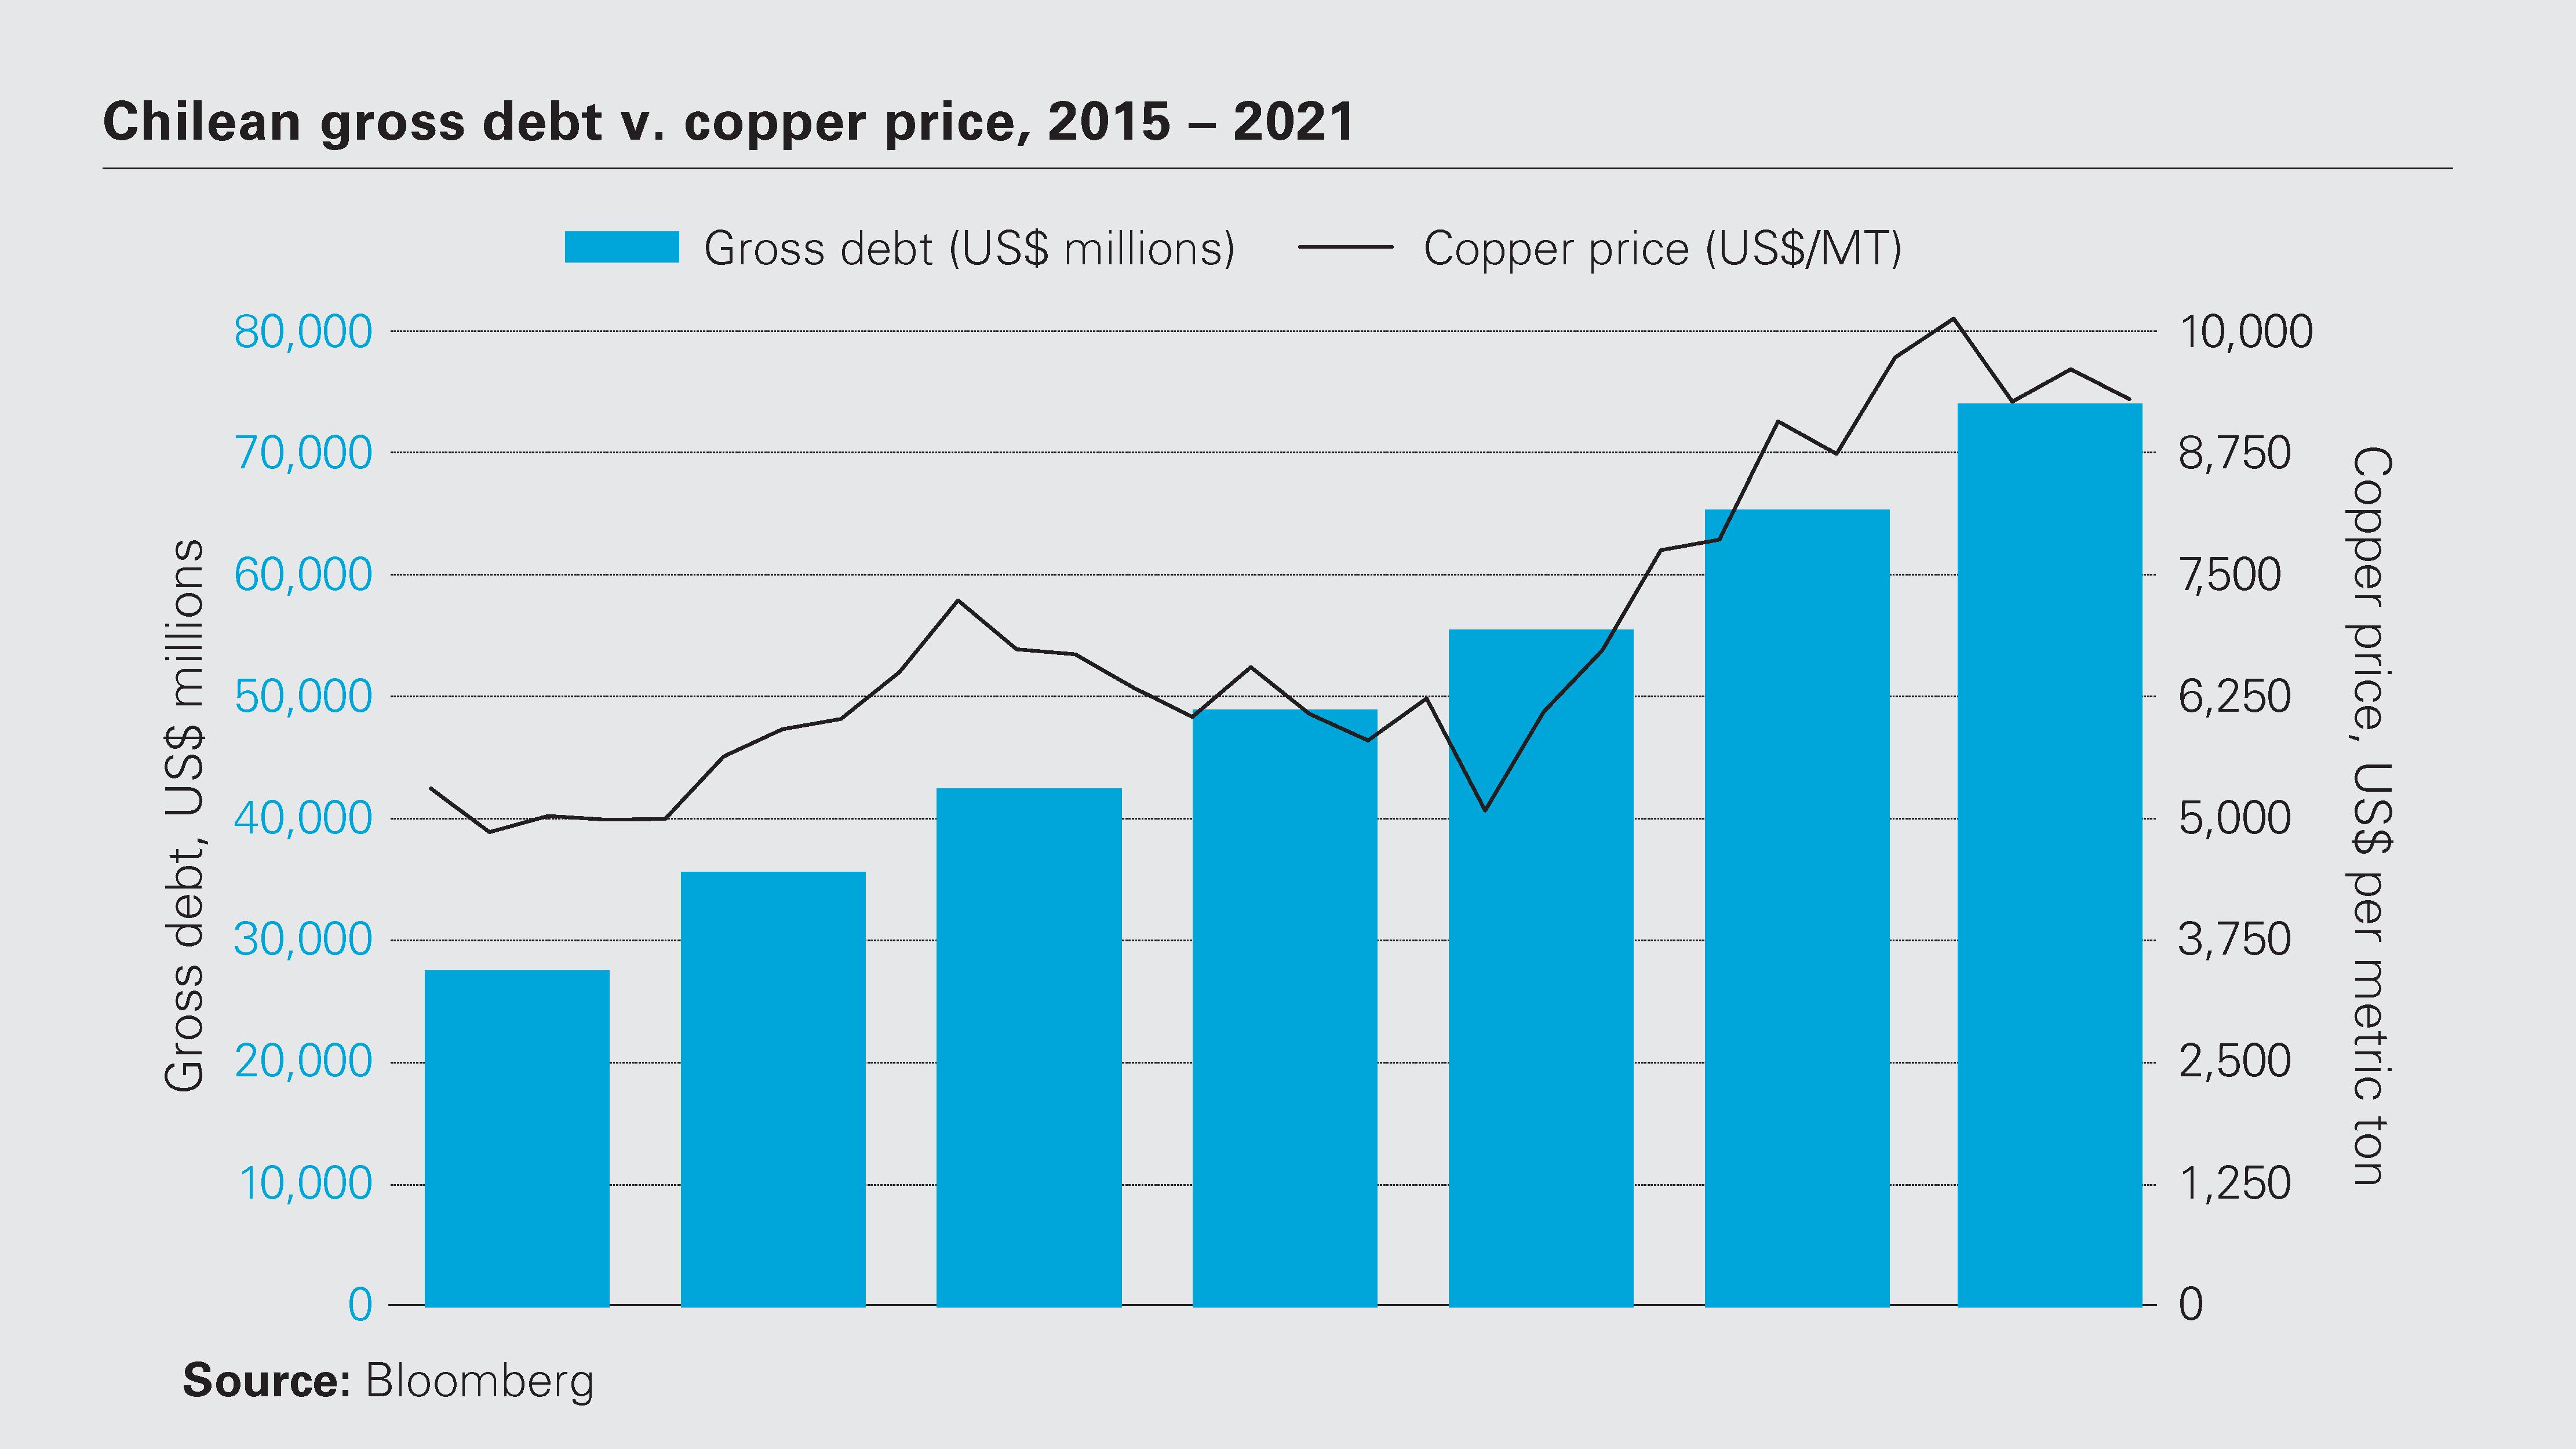 Chilean gross debt v. copper price, 2015 – 2021